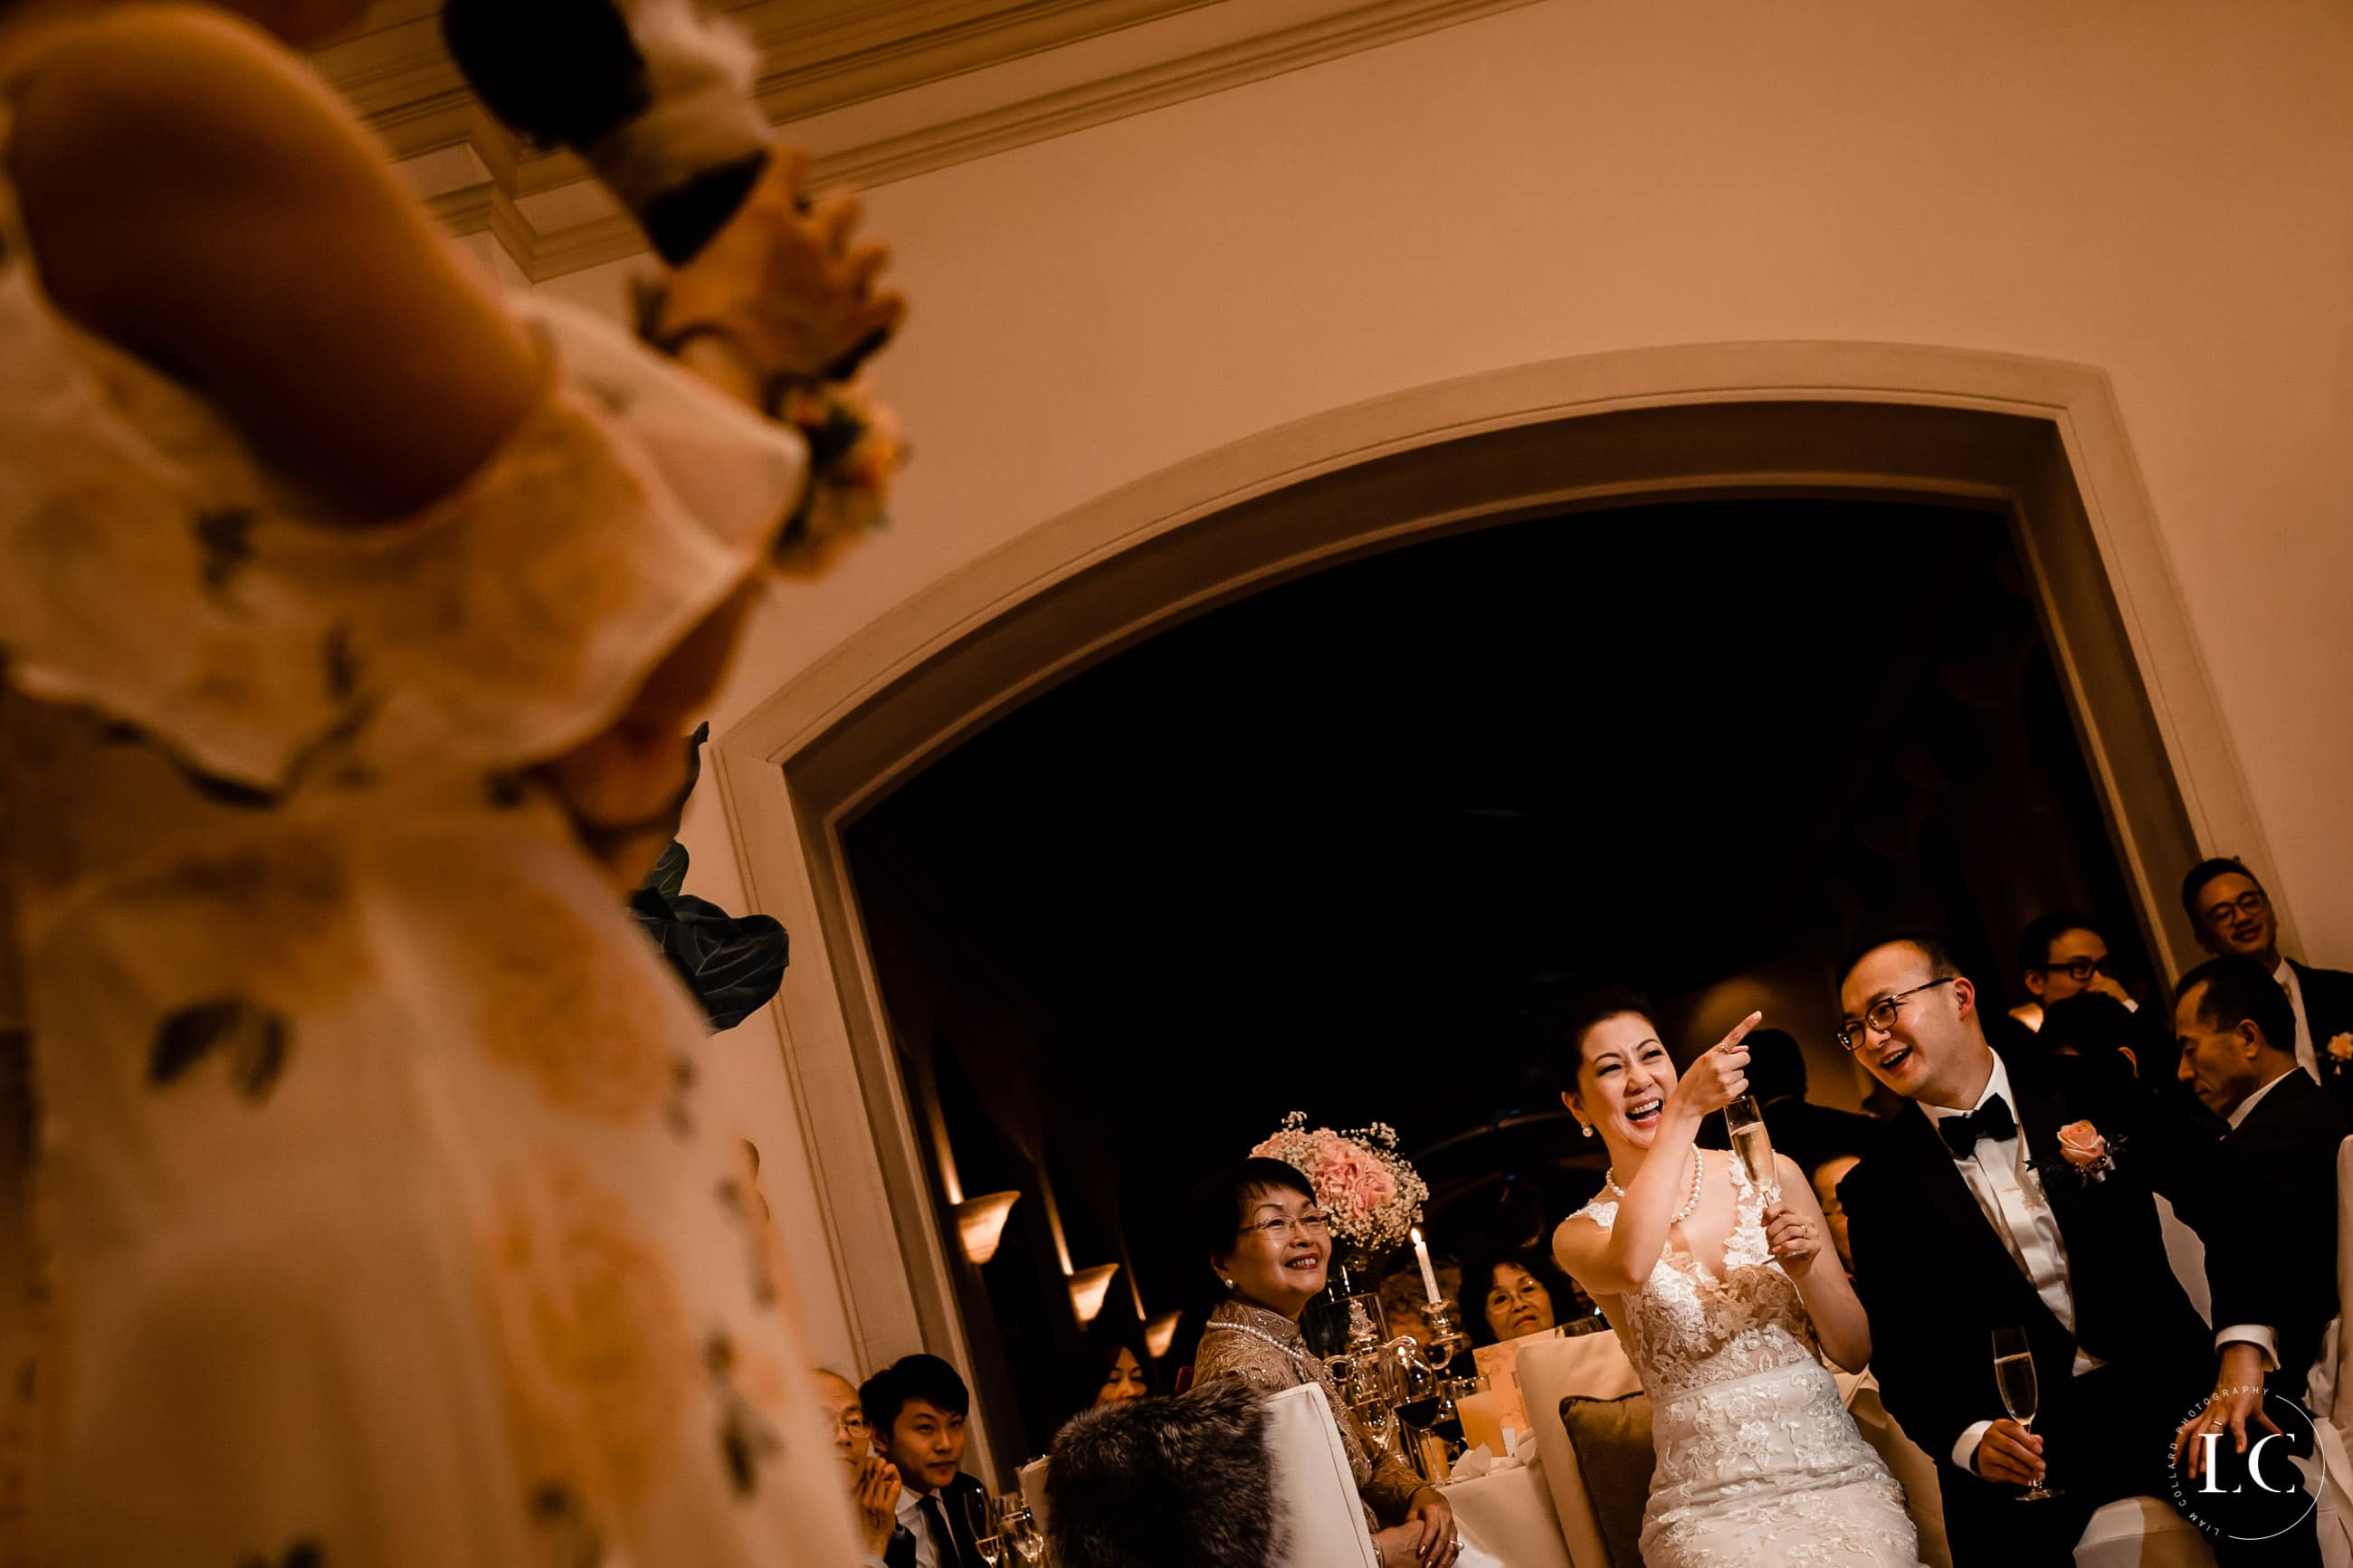 Speeches at Hong Kong wedding